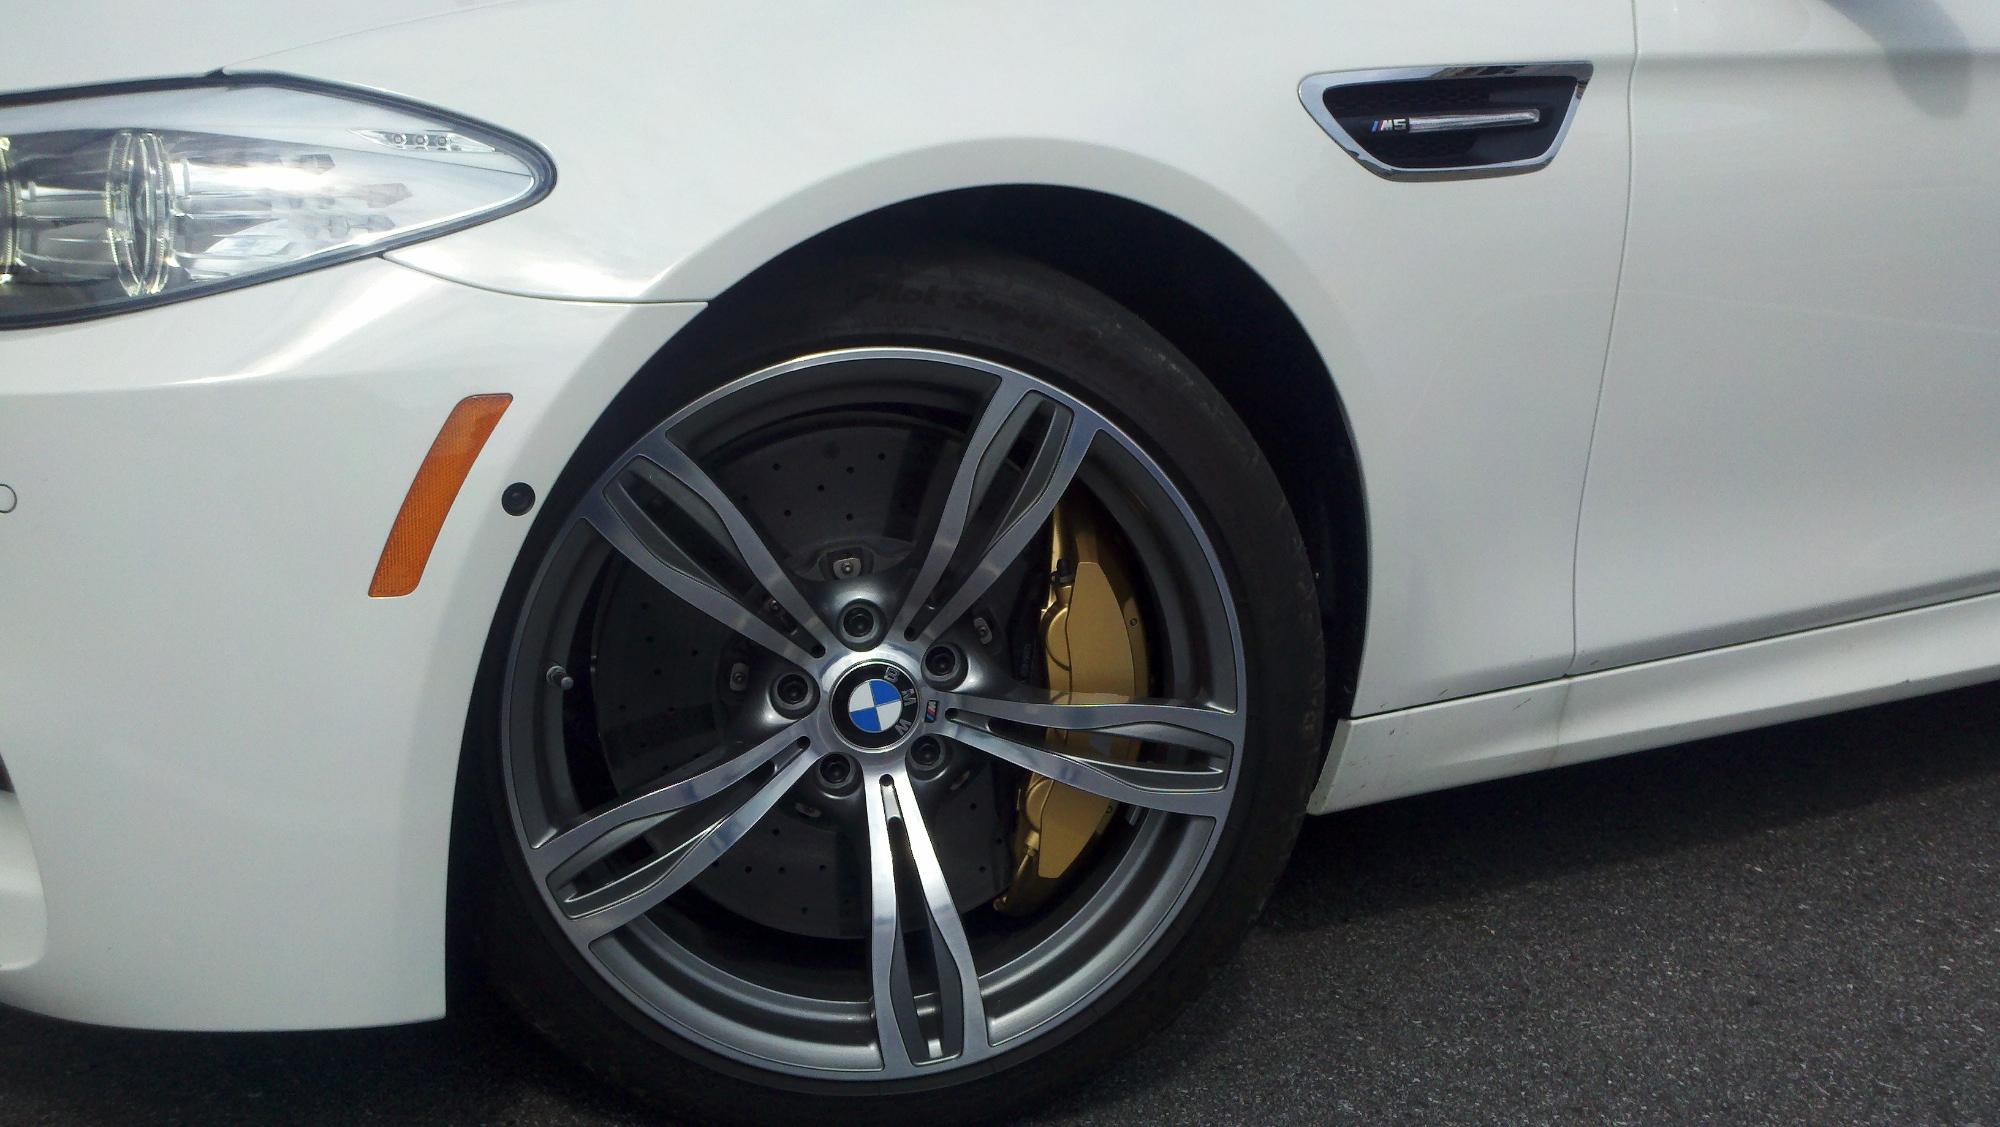 F10 BMW M5 ceramic brakes